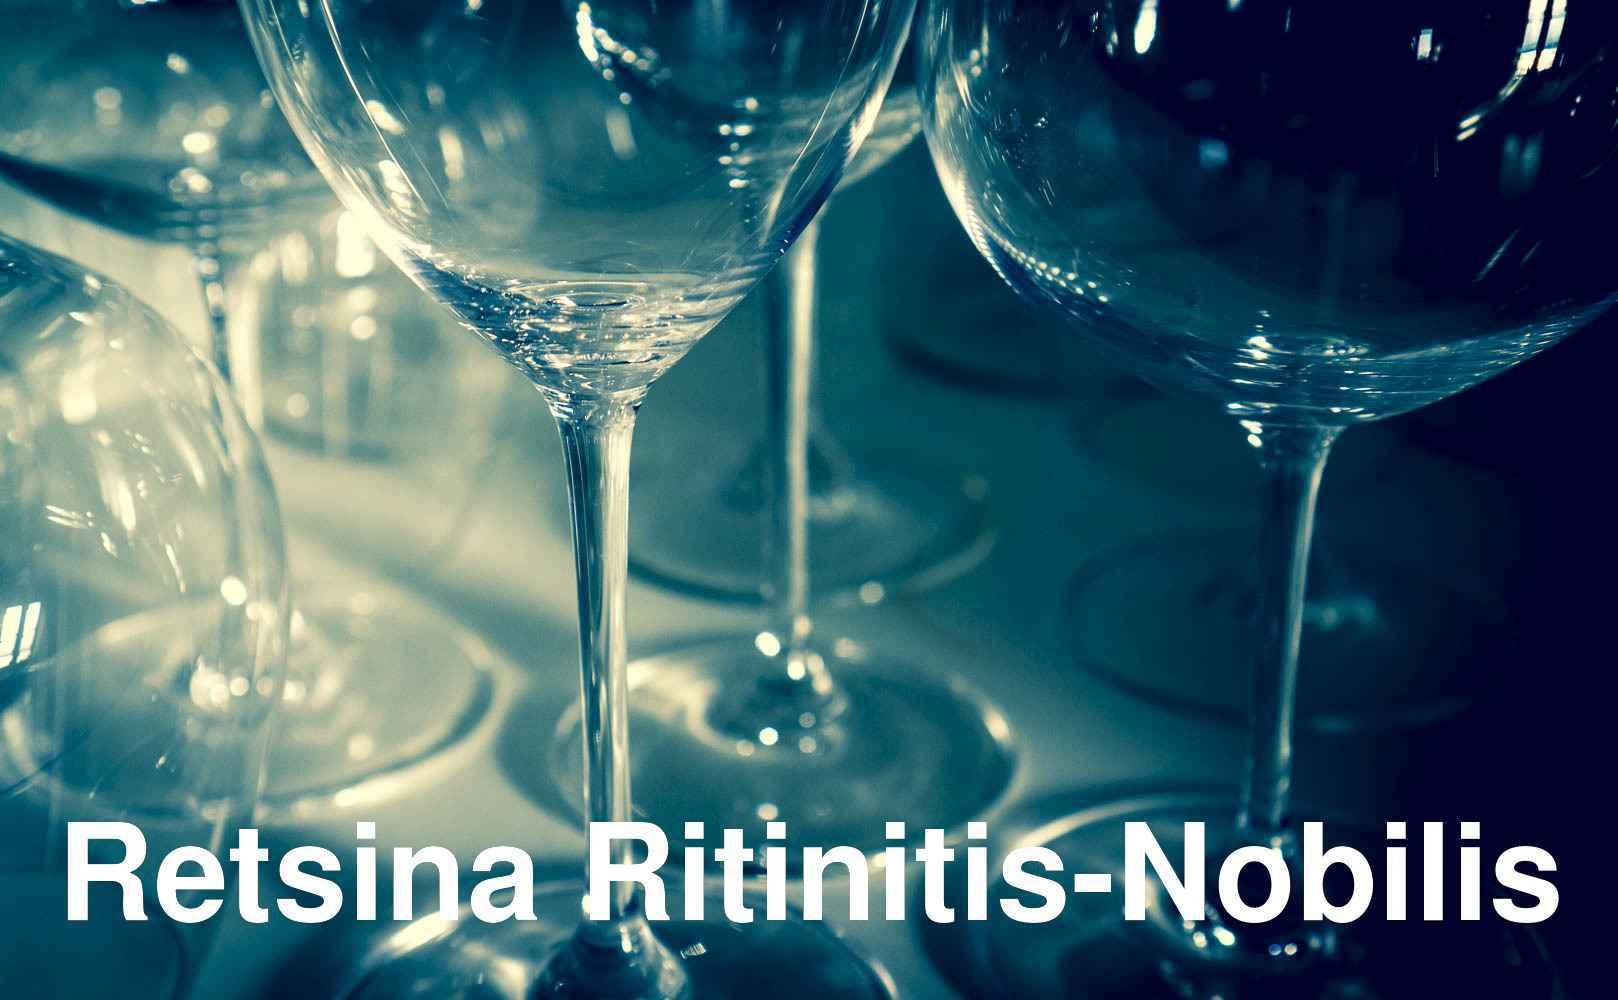 Go to Retsina Ritinitis-Nobilis von Gaia Wines aus Nemea, Griechenland